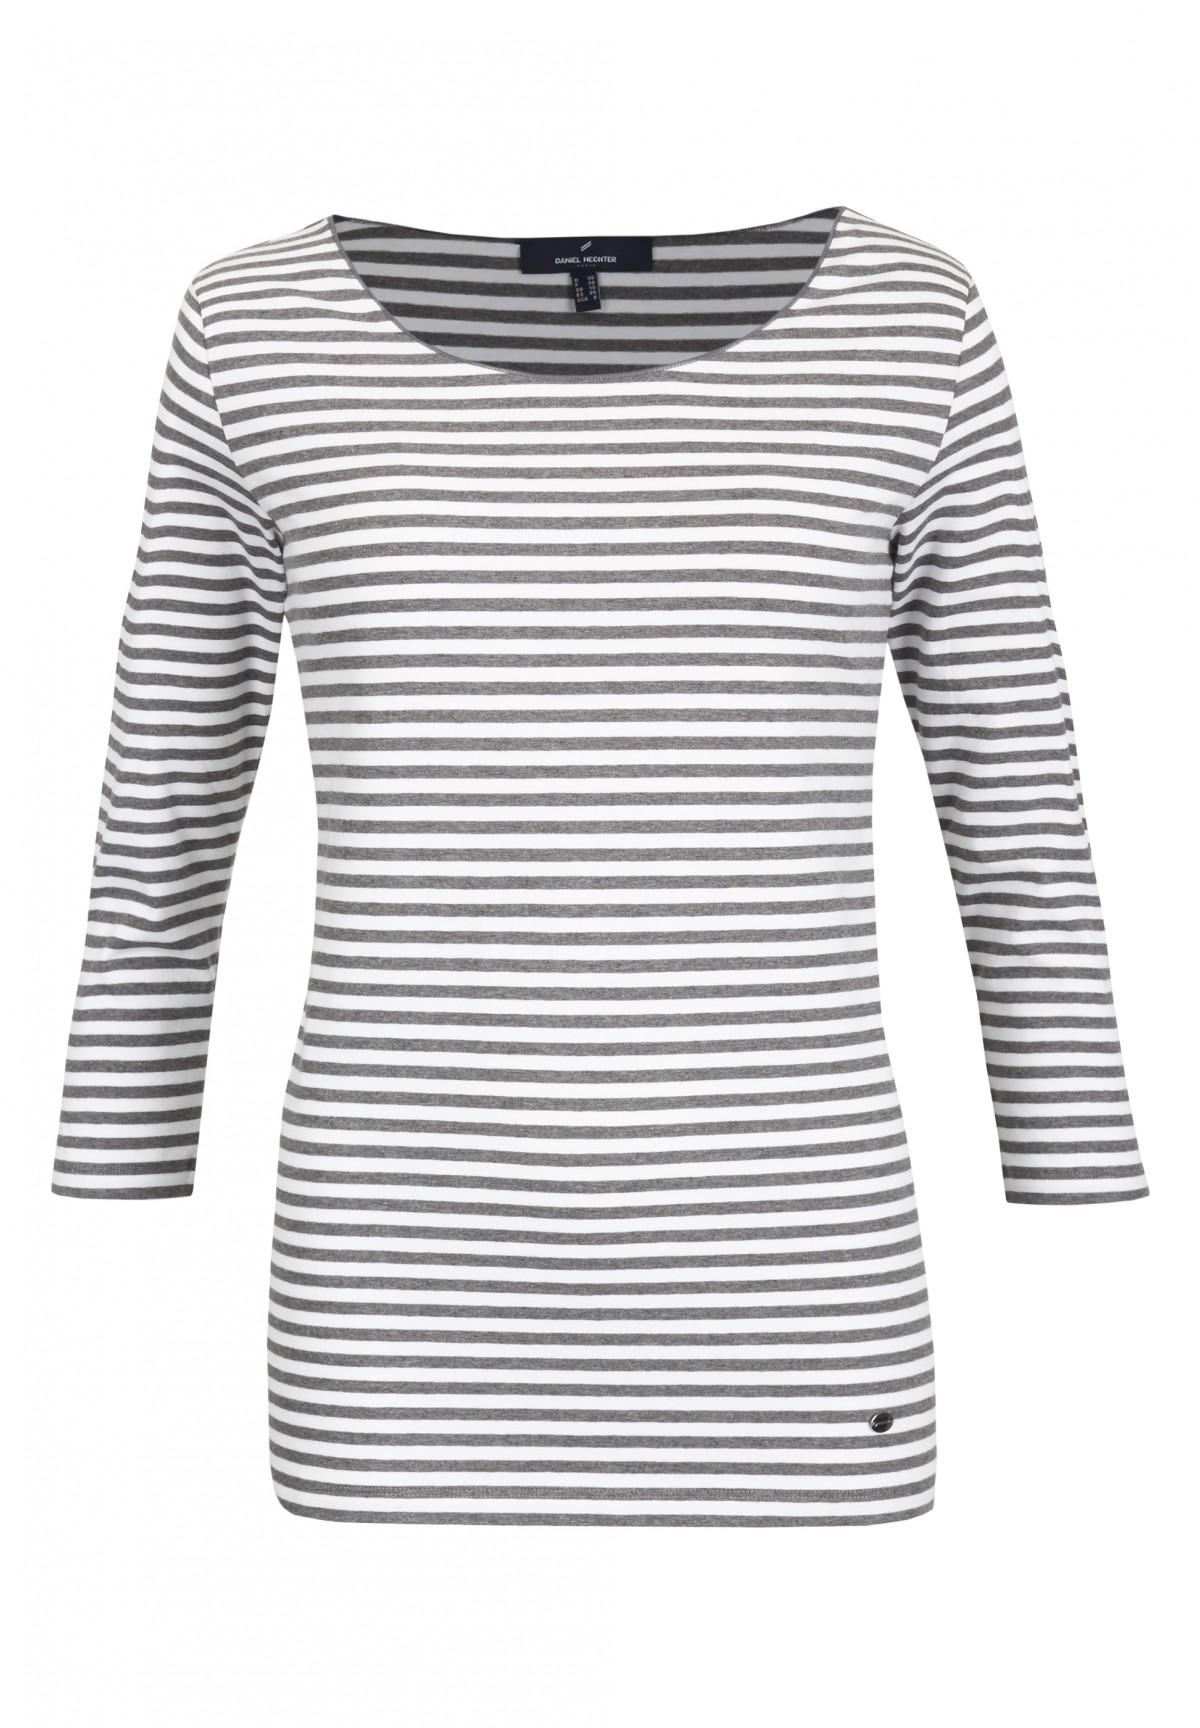 Shirt Celine / T-Shirt